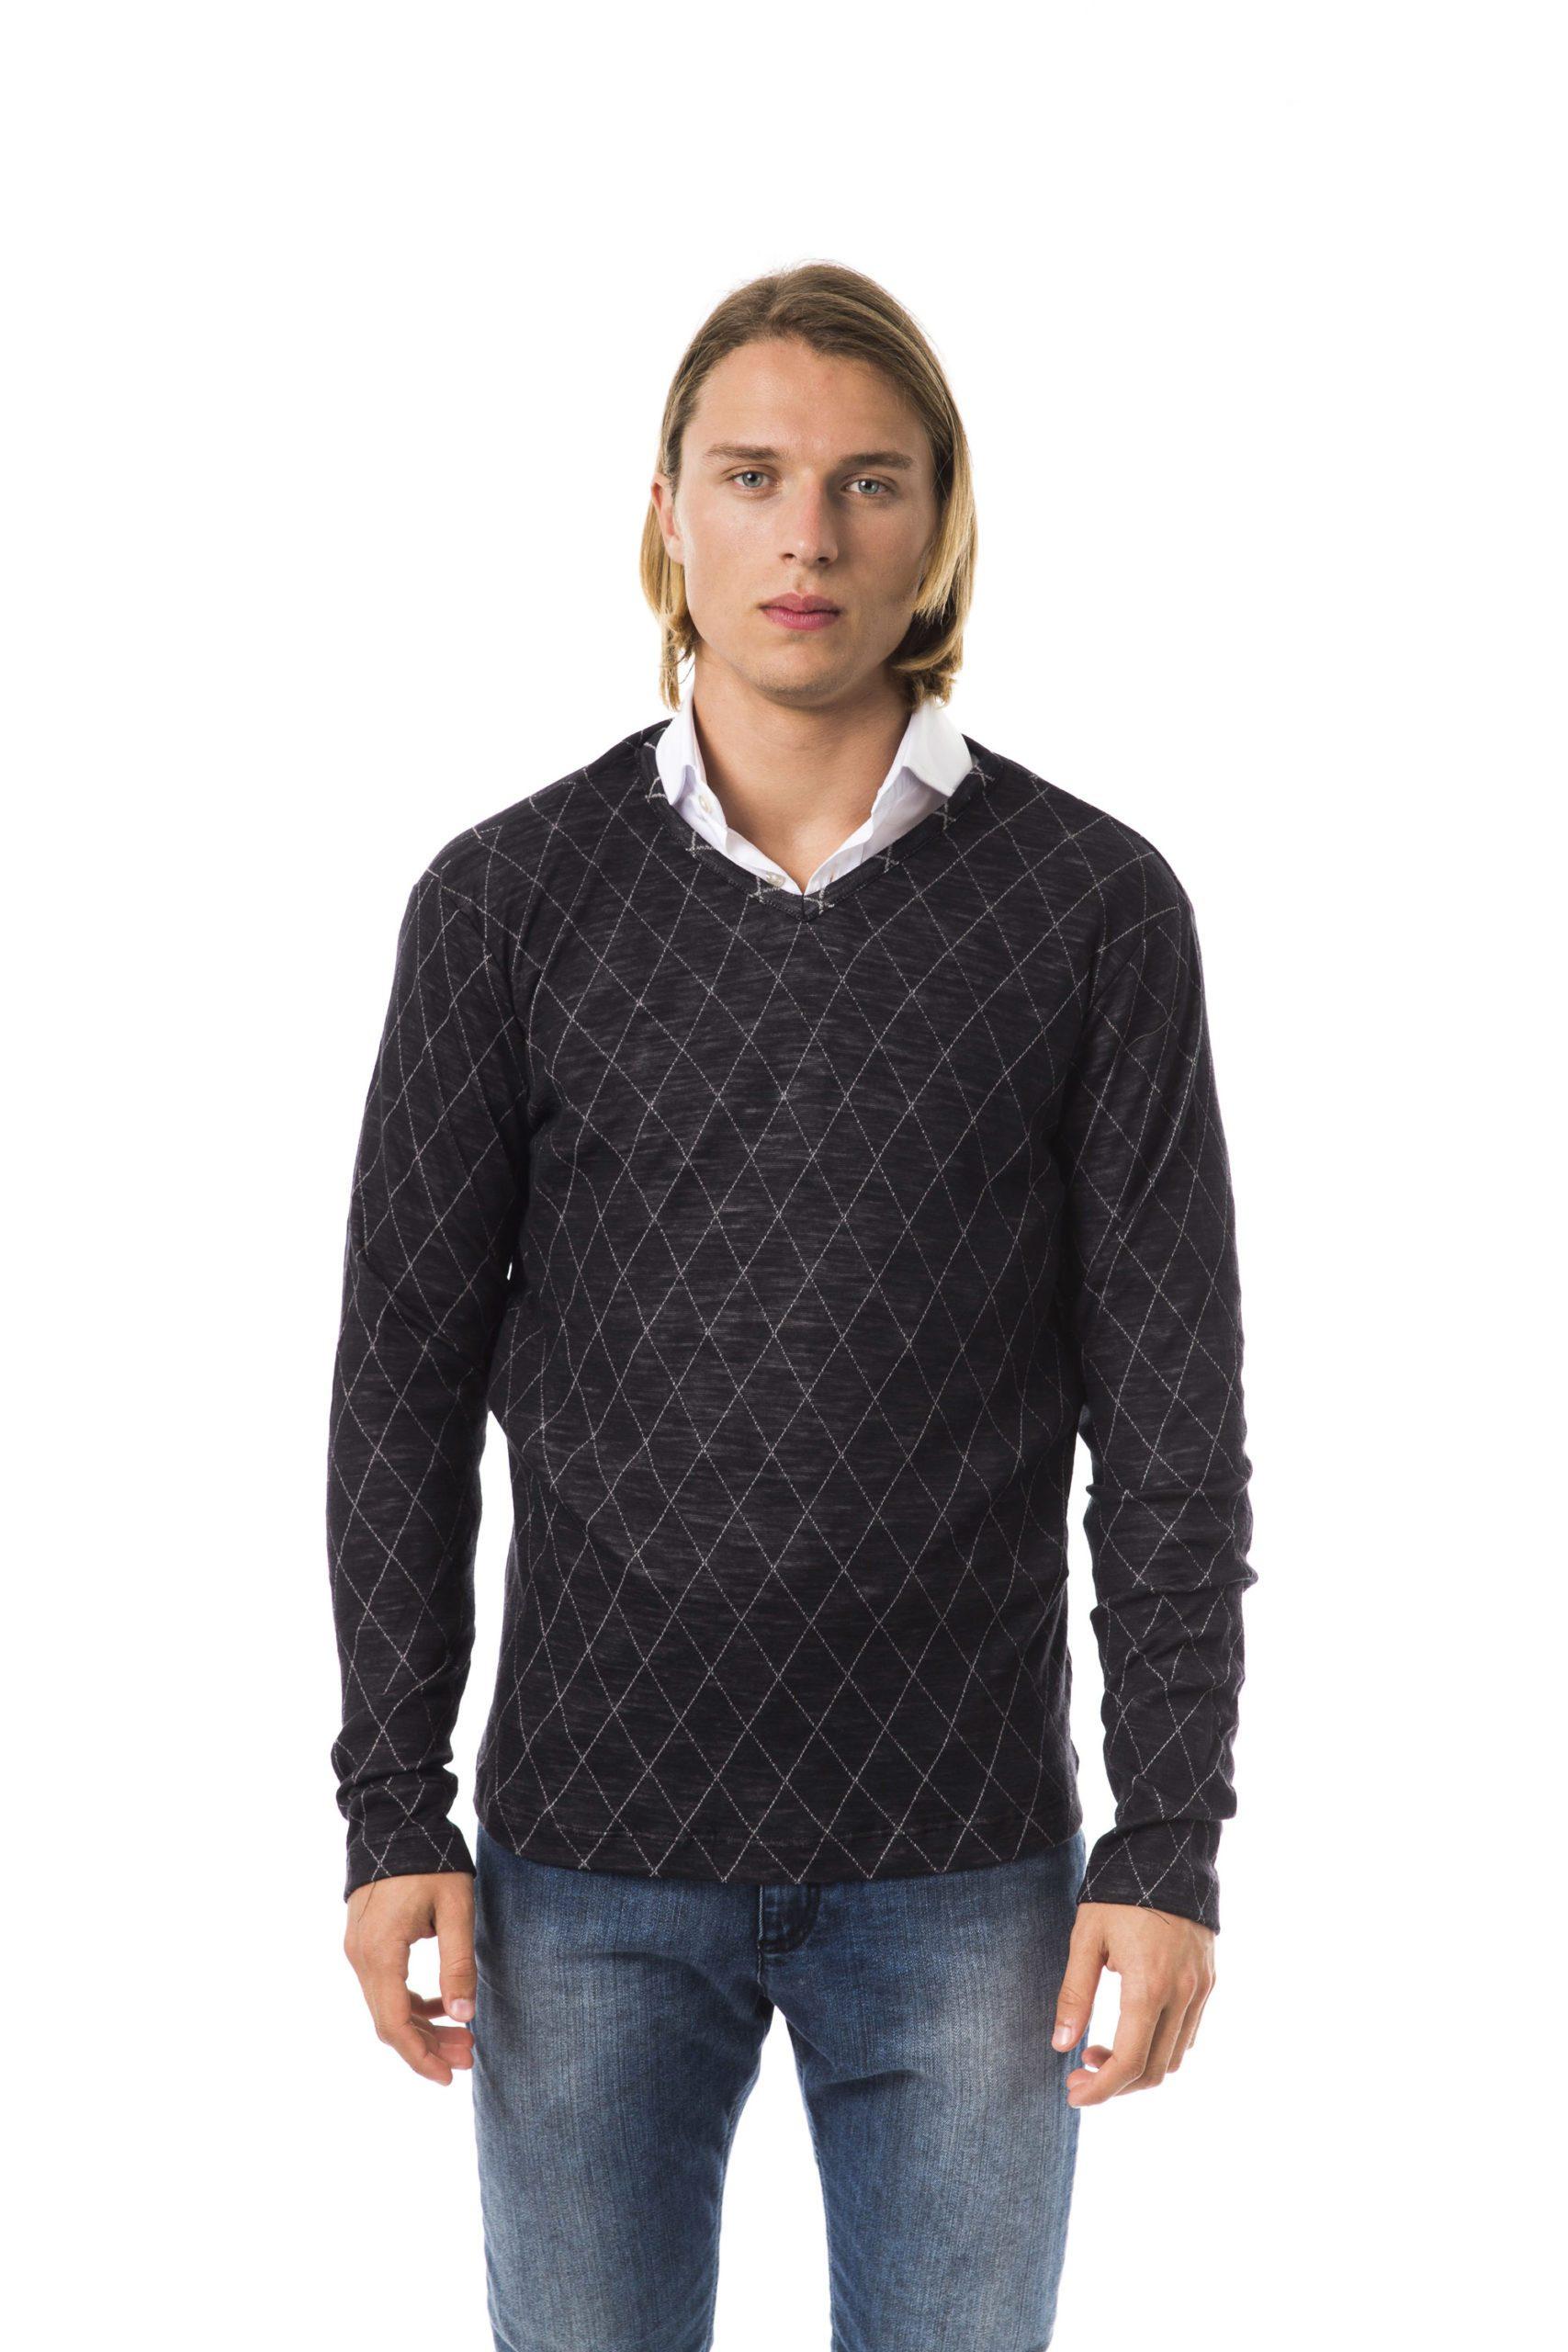 Byblos Men's Sweater Black BY817227 - S